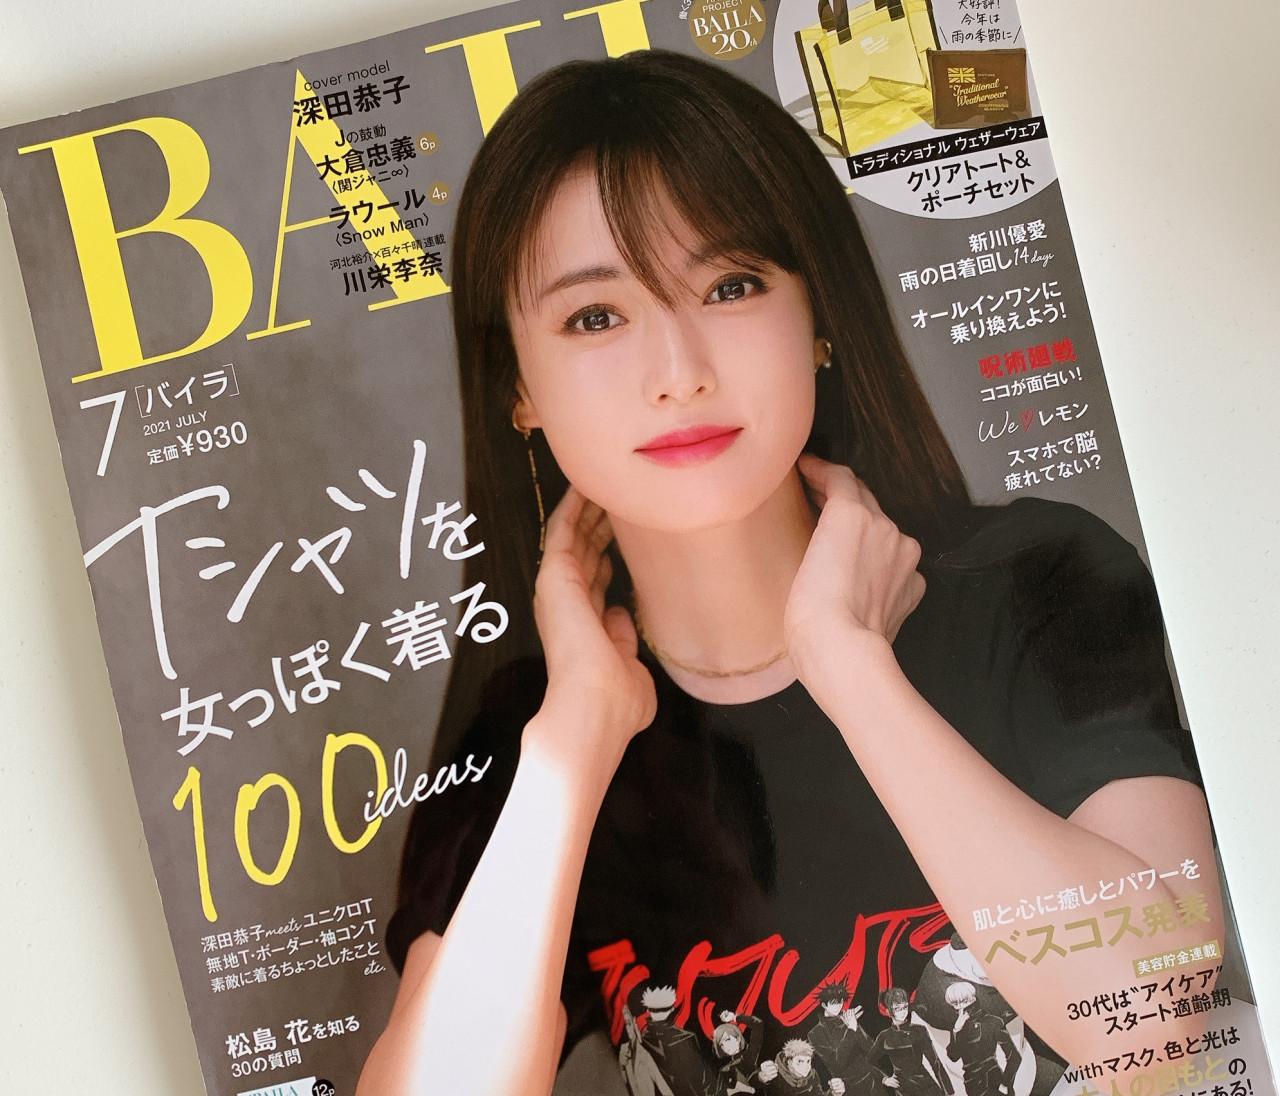 BAILA7月号発売中!付録はクリアトート&ポーチセット